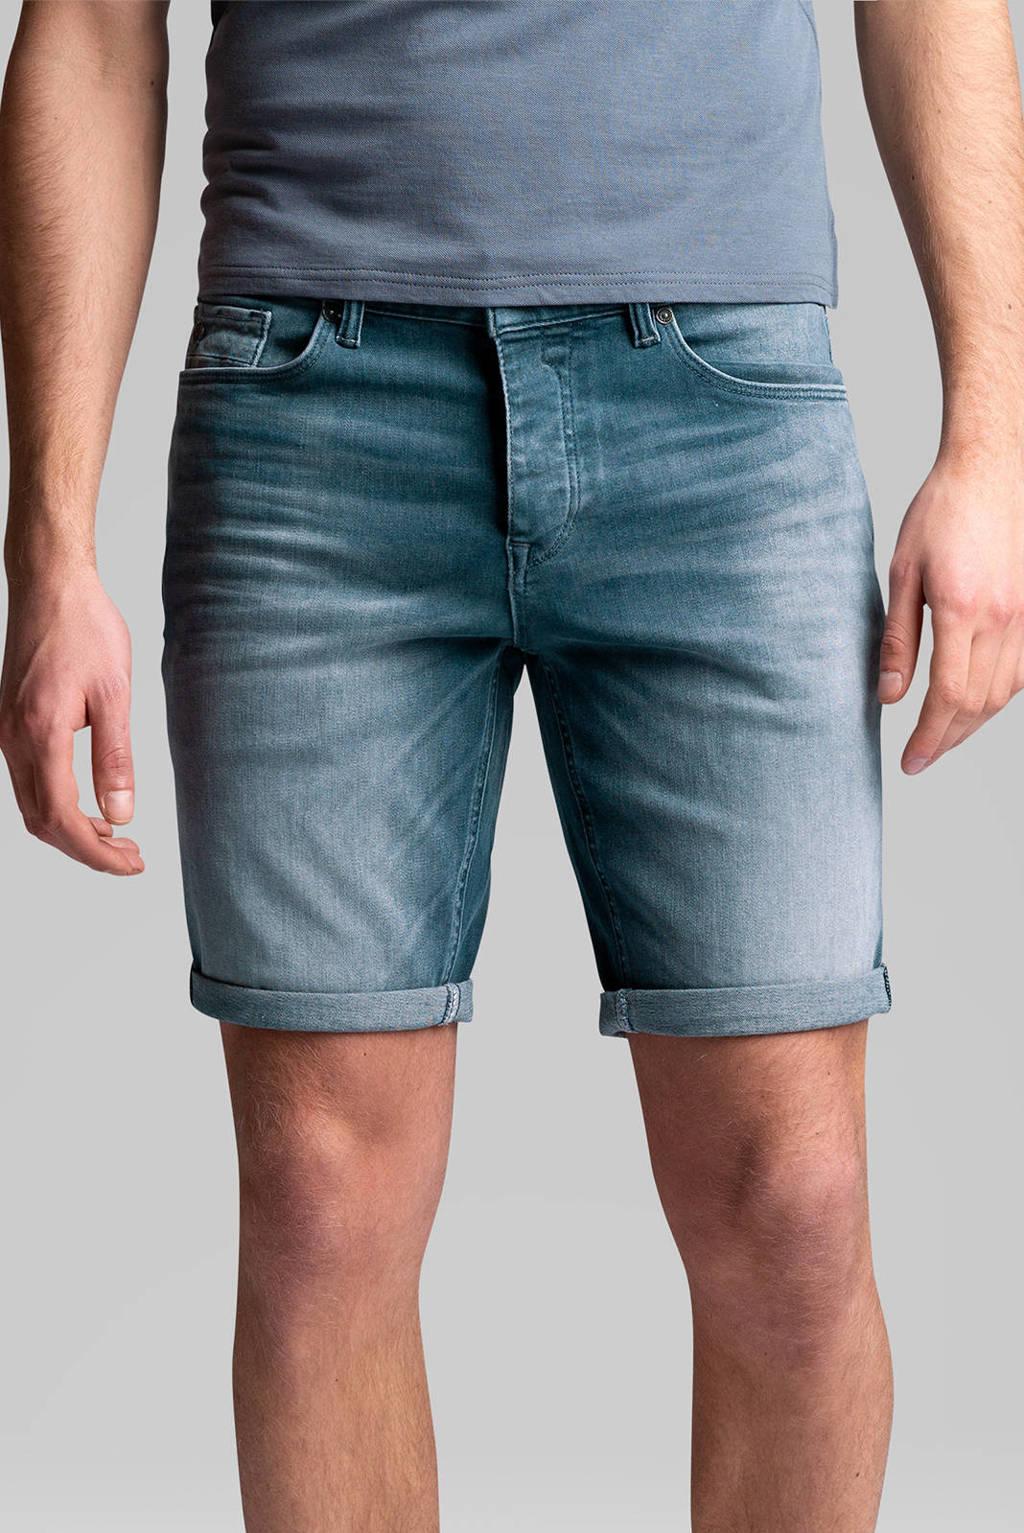 Cast Iron regular fit jeans short Cope grijsblauw, Grijsblauw